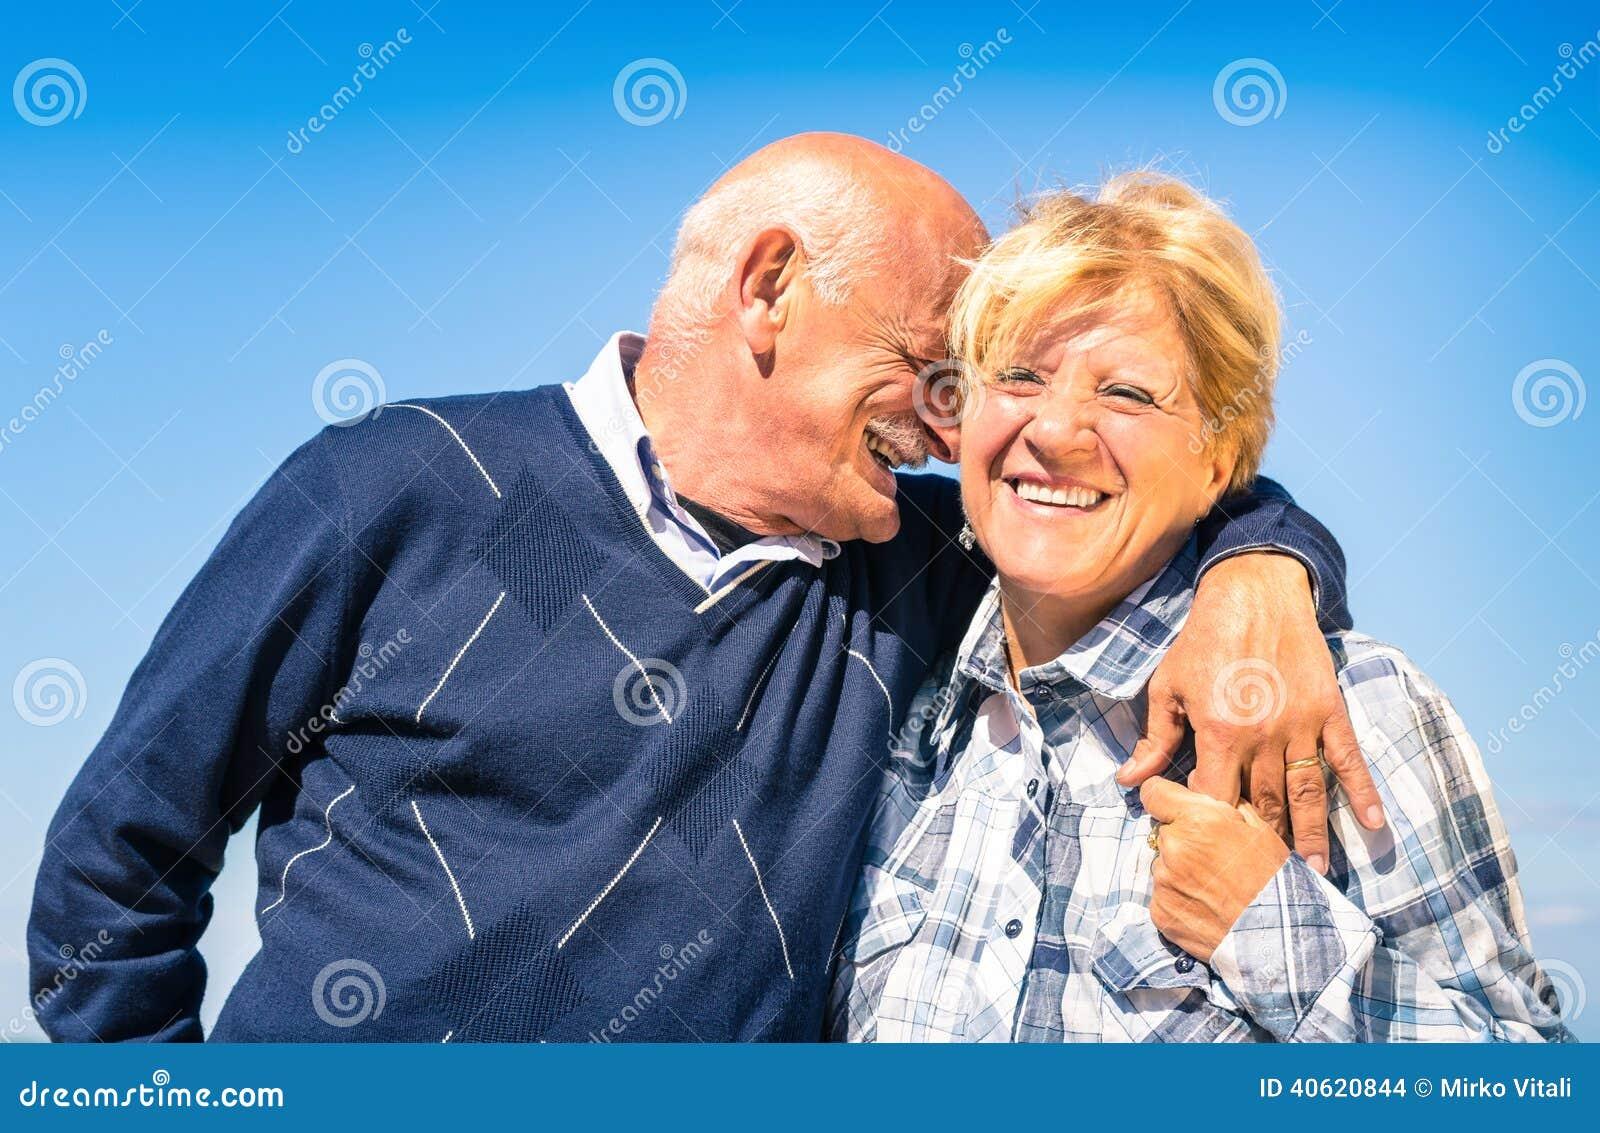 Pares superiores felizes no amor na aposentadoria - estilo de vida idoso alegre